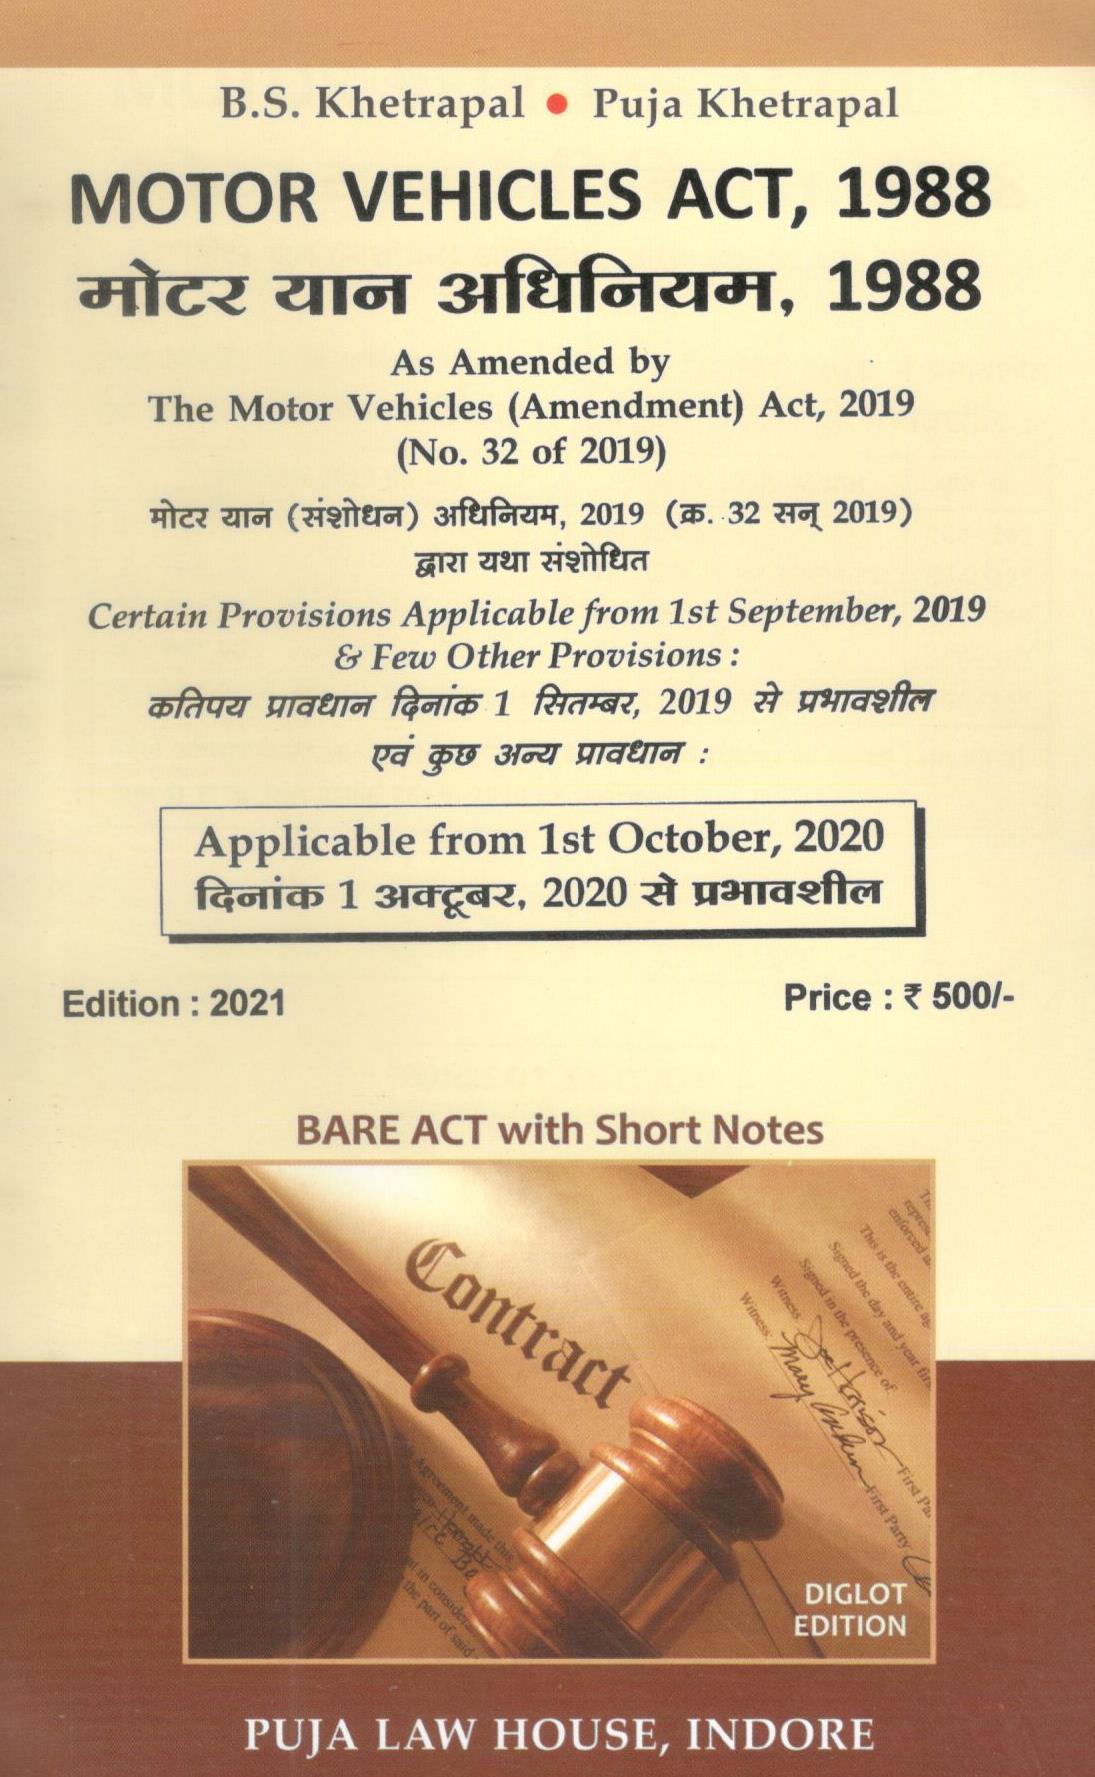 मोटर यान अधिनियम, 1988 / Motor Vehicles Act, 1988